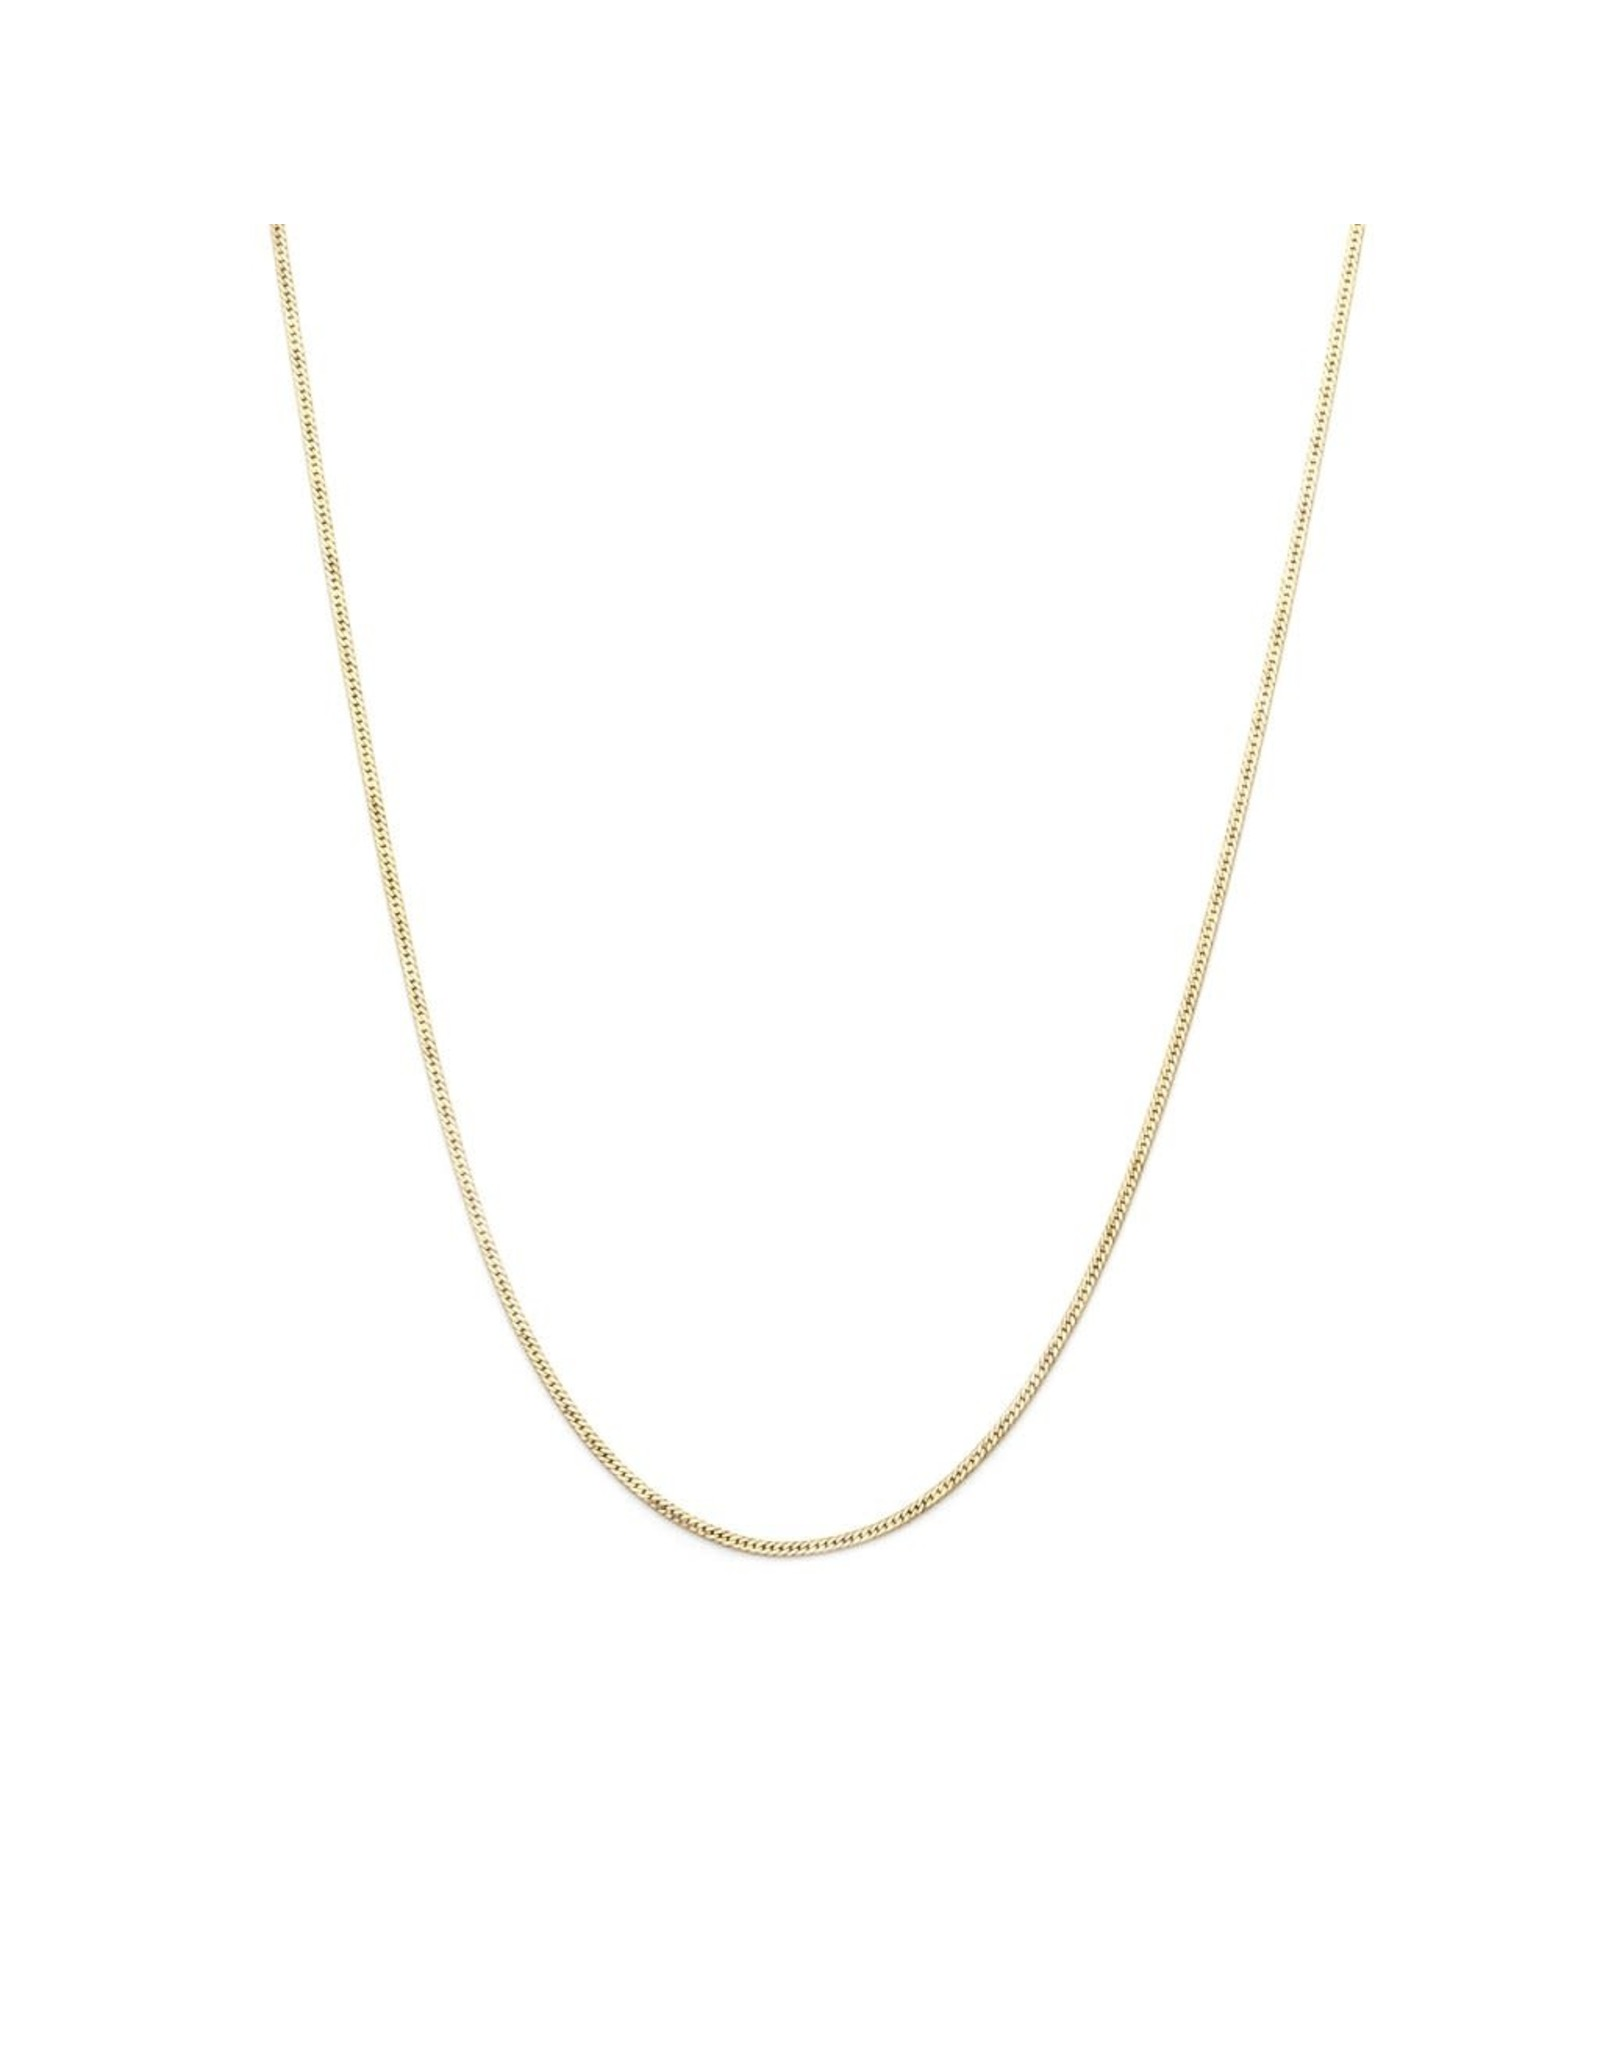 leah alexandra Herringbone Chain Necklace   Goldfill